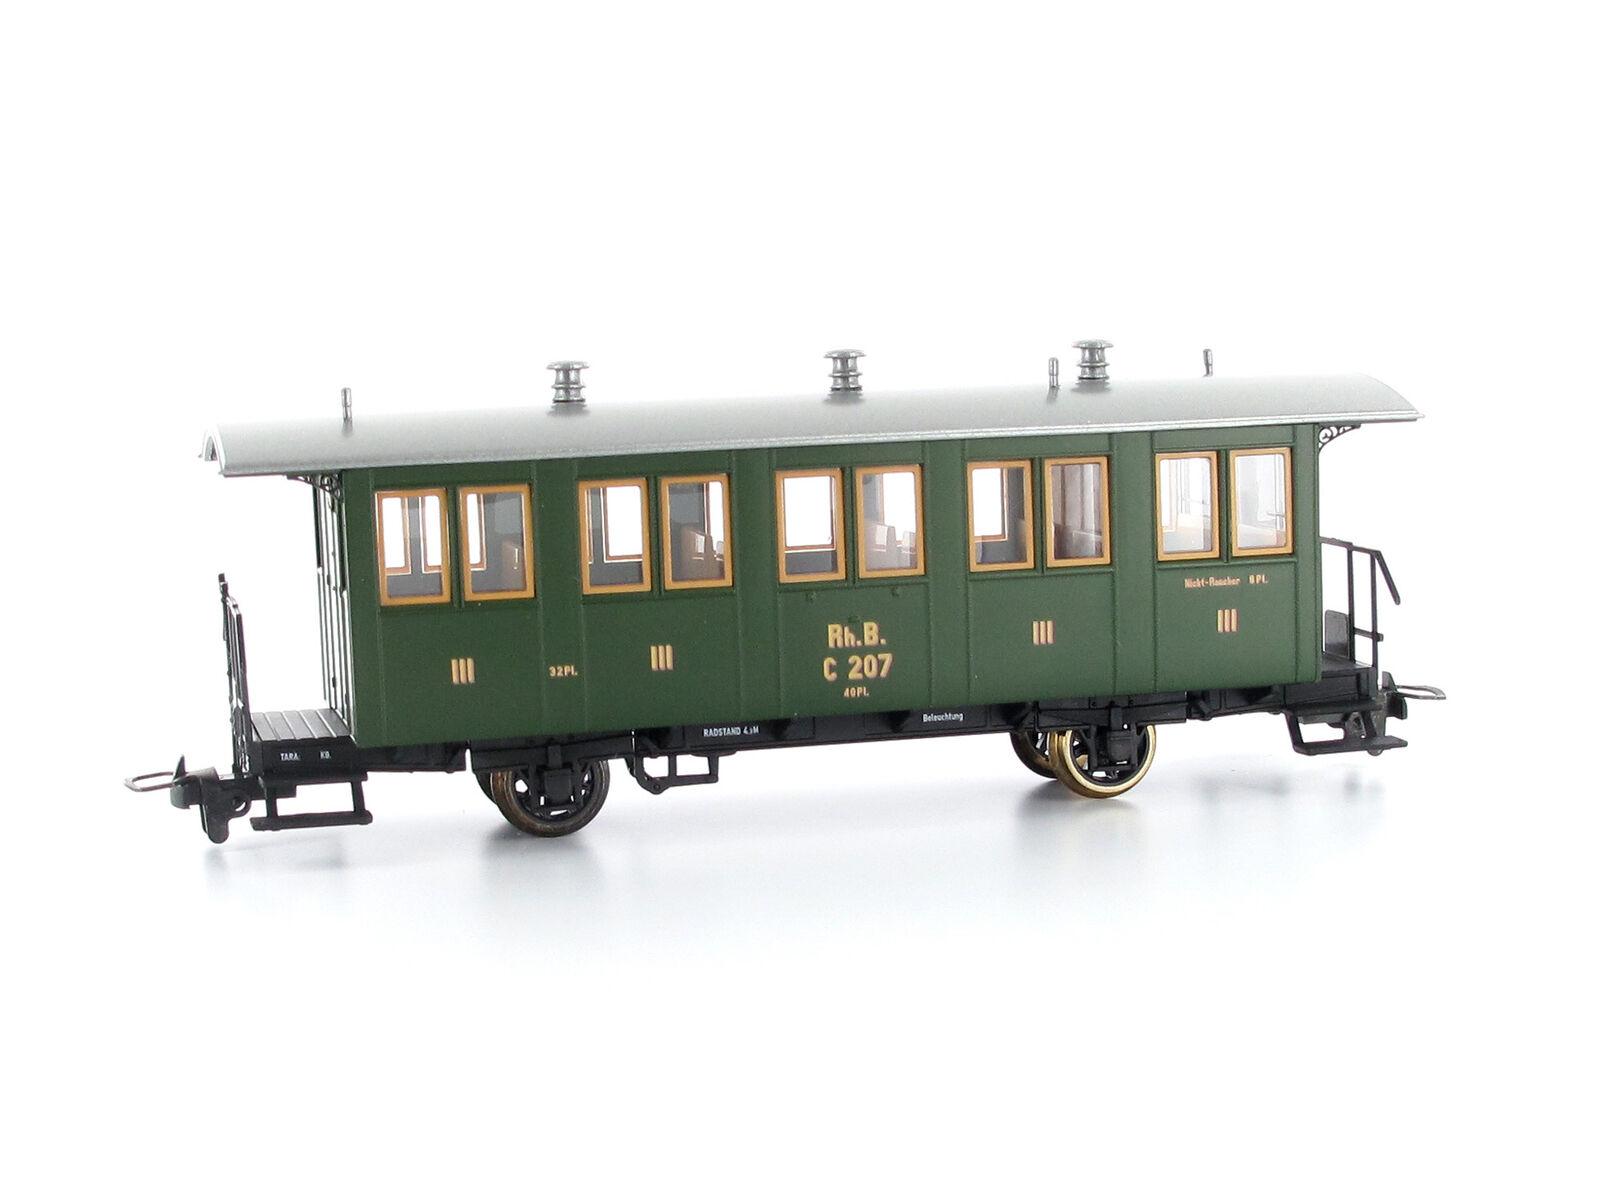 BEMO 3234127 vagoni c.207 RHB h0m